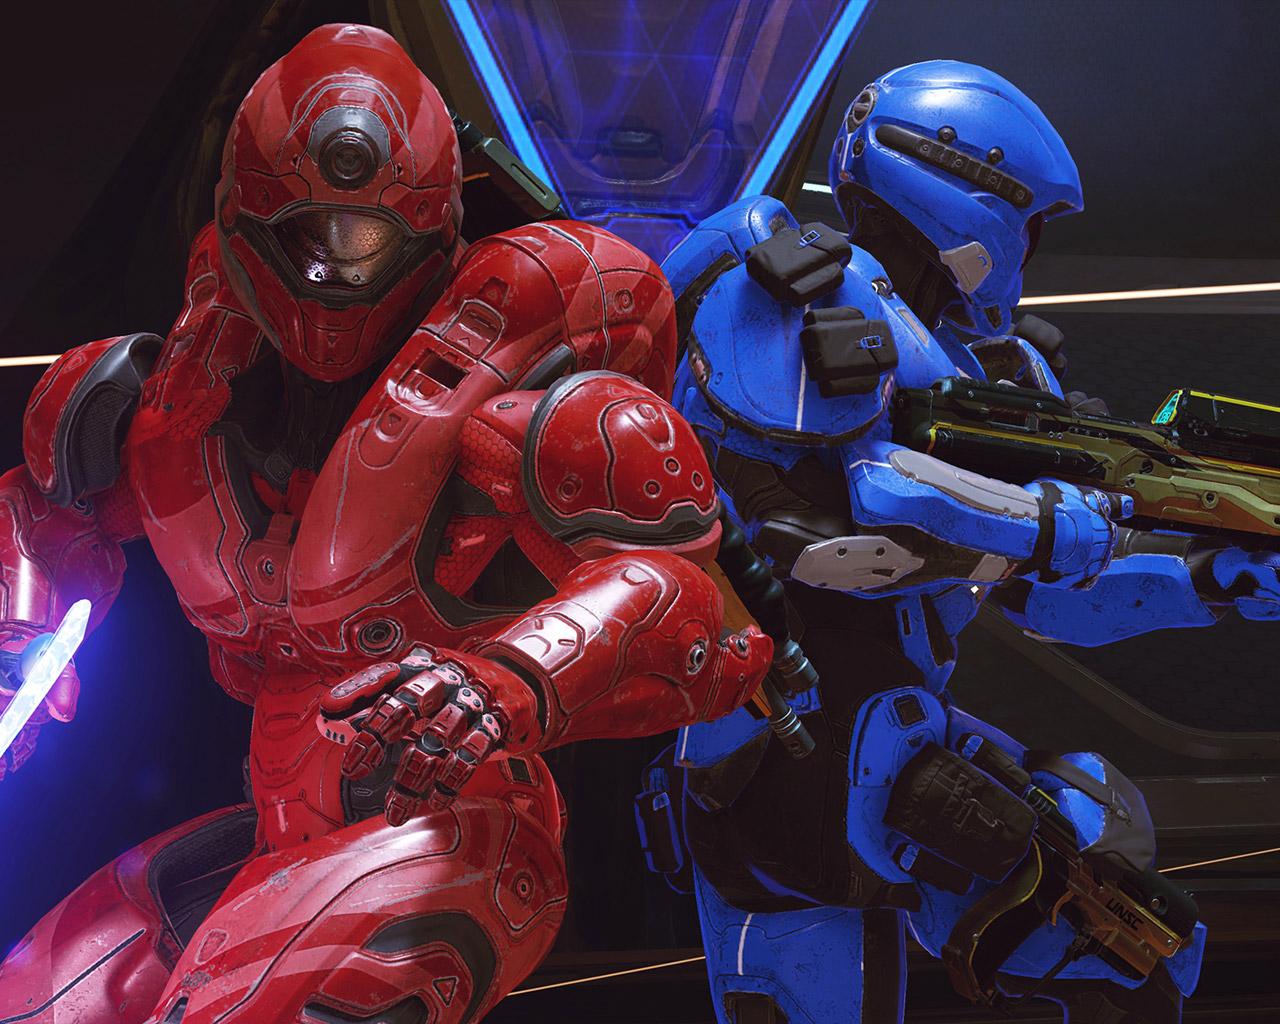 Halo 5: Guardians Wallpaper in 1280x1024